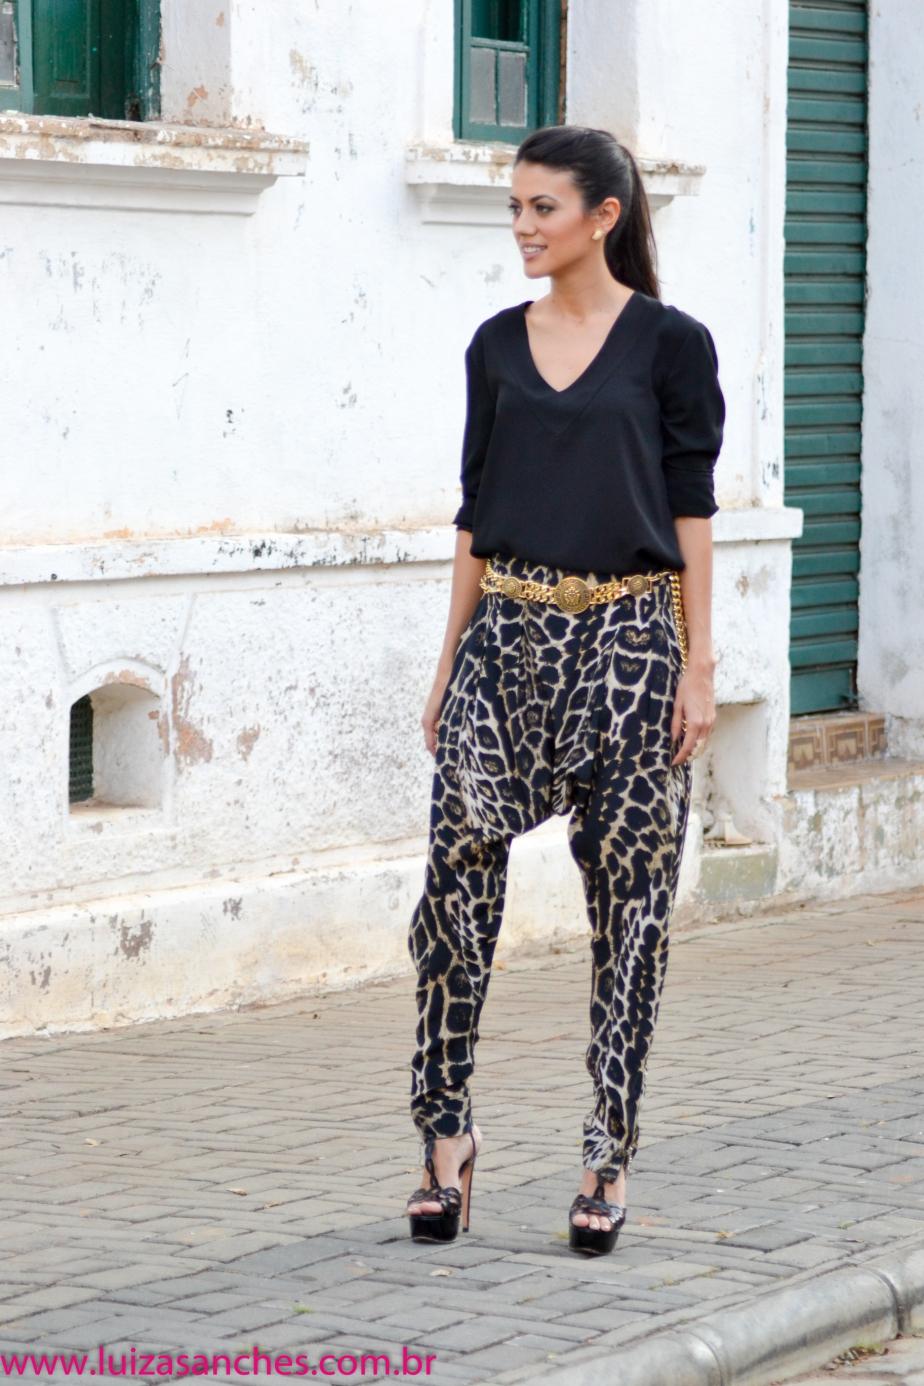 Blog da Luiza Sanches 2-9